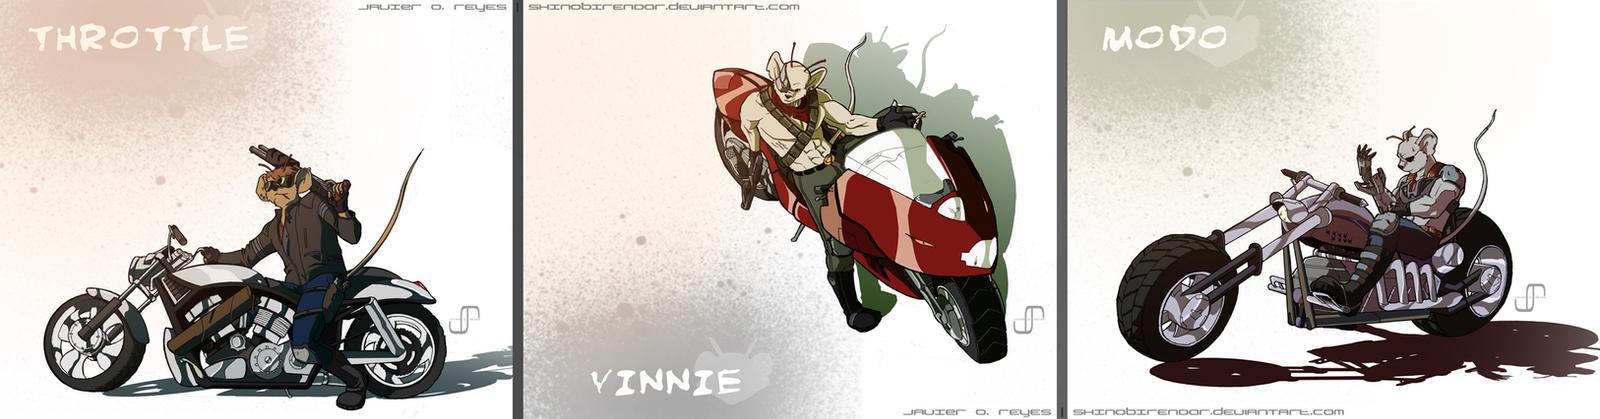 commish: Biker Mice from Mars by JavierReyes on DeviantArt